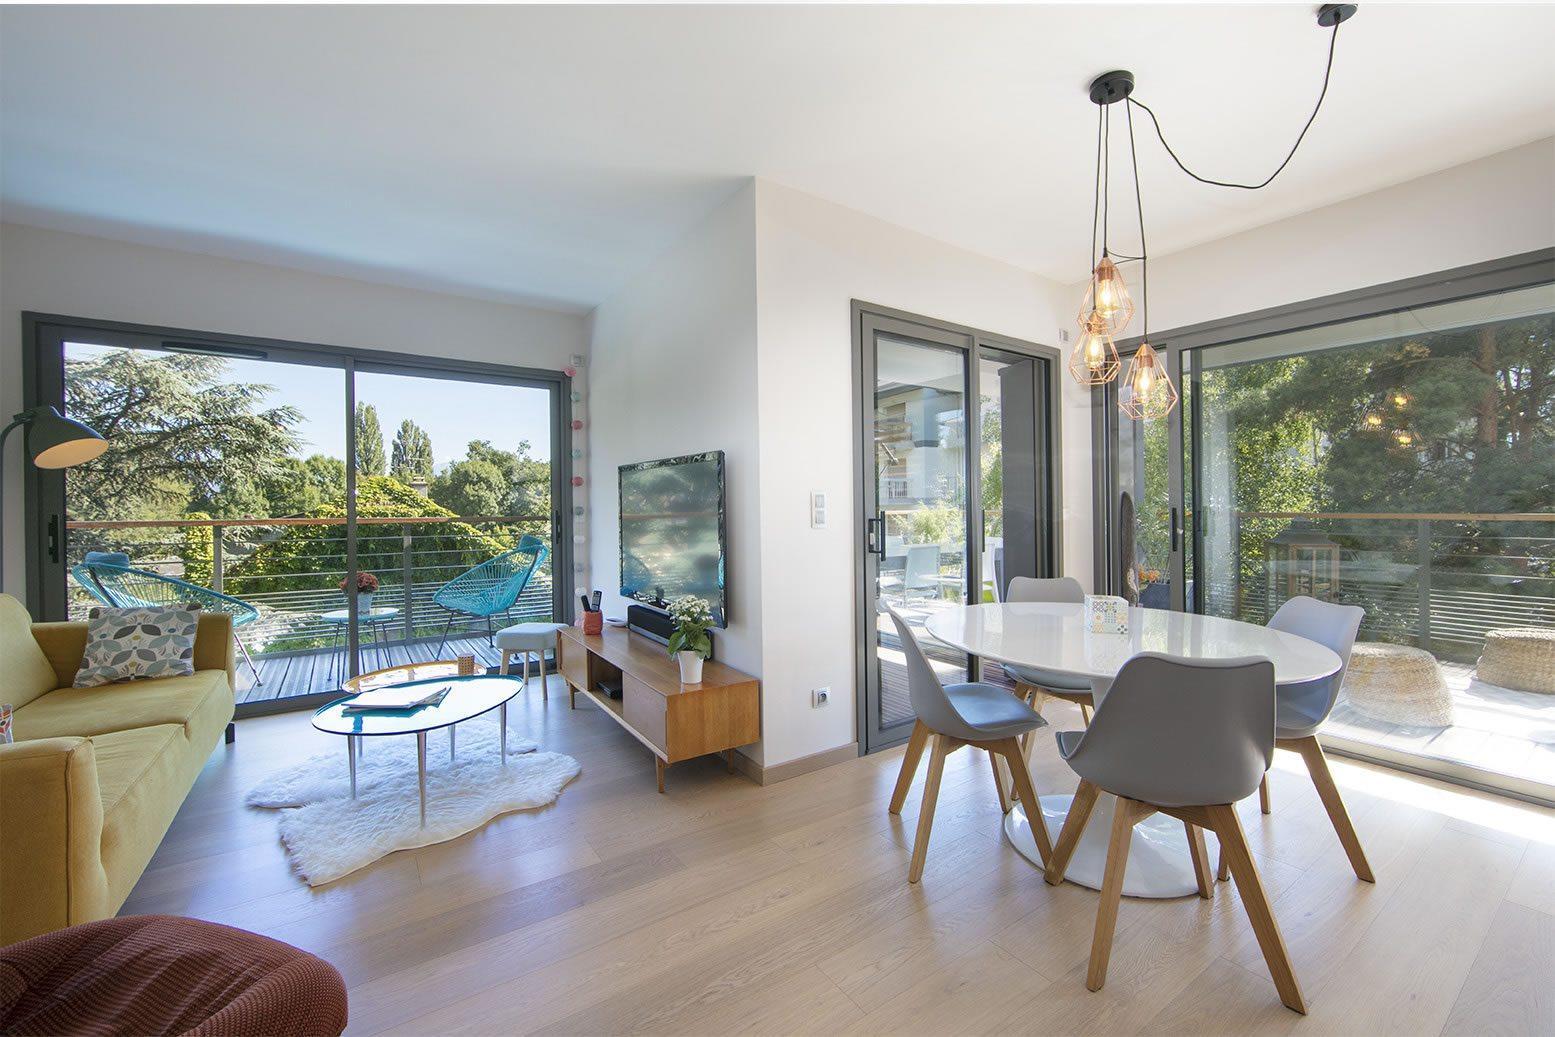 appartement de standing de 100 m2 vendre albigny. Black Bedroom Furniture Sets. Home Design Ideas